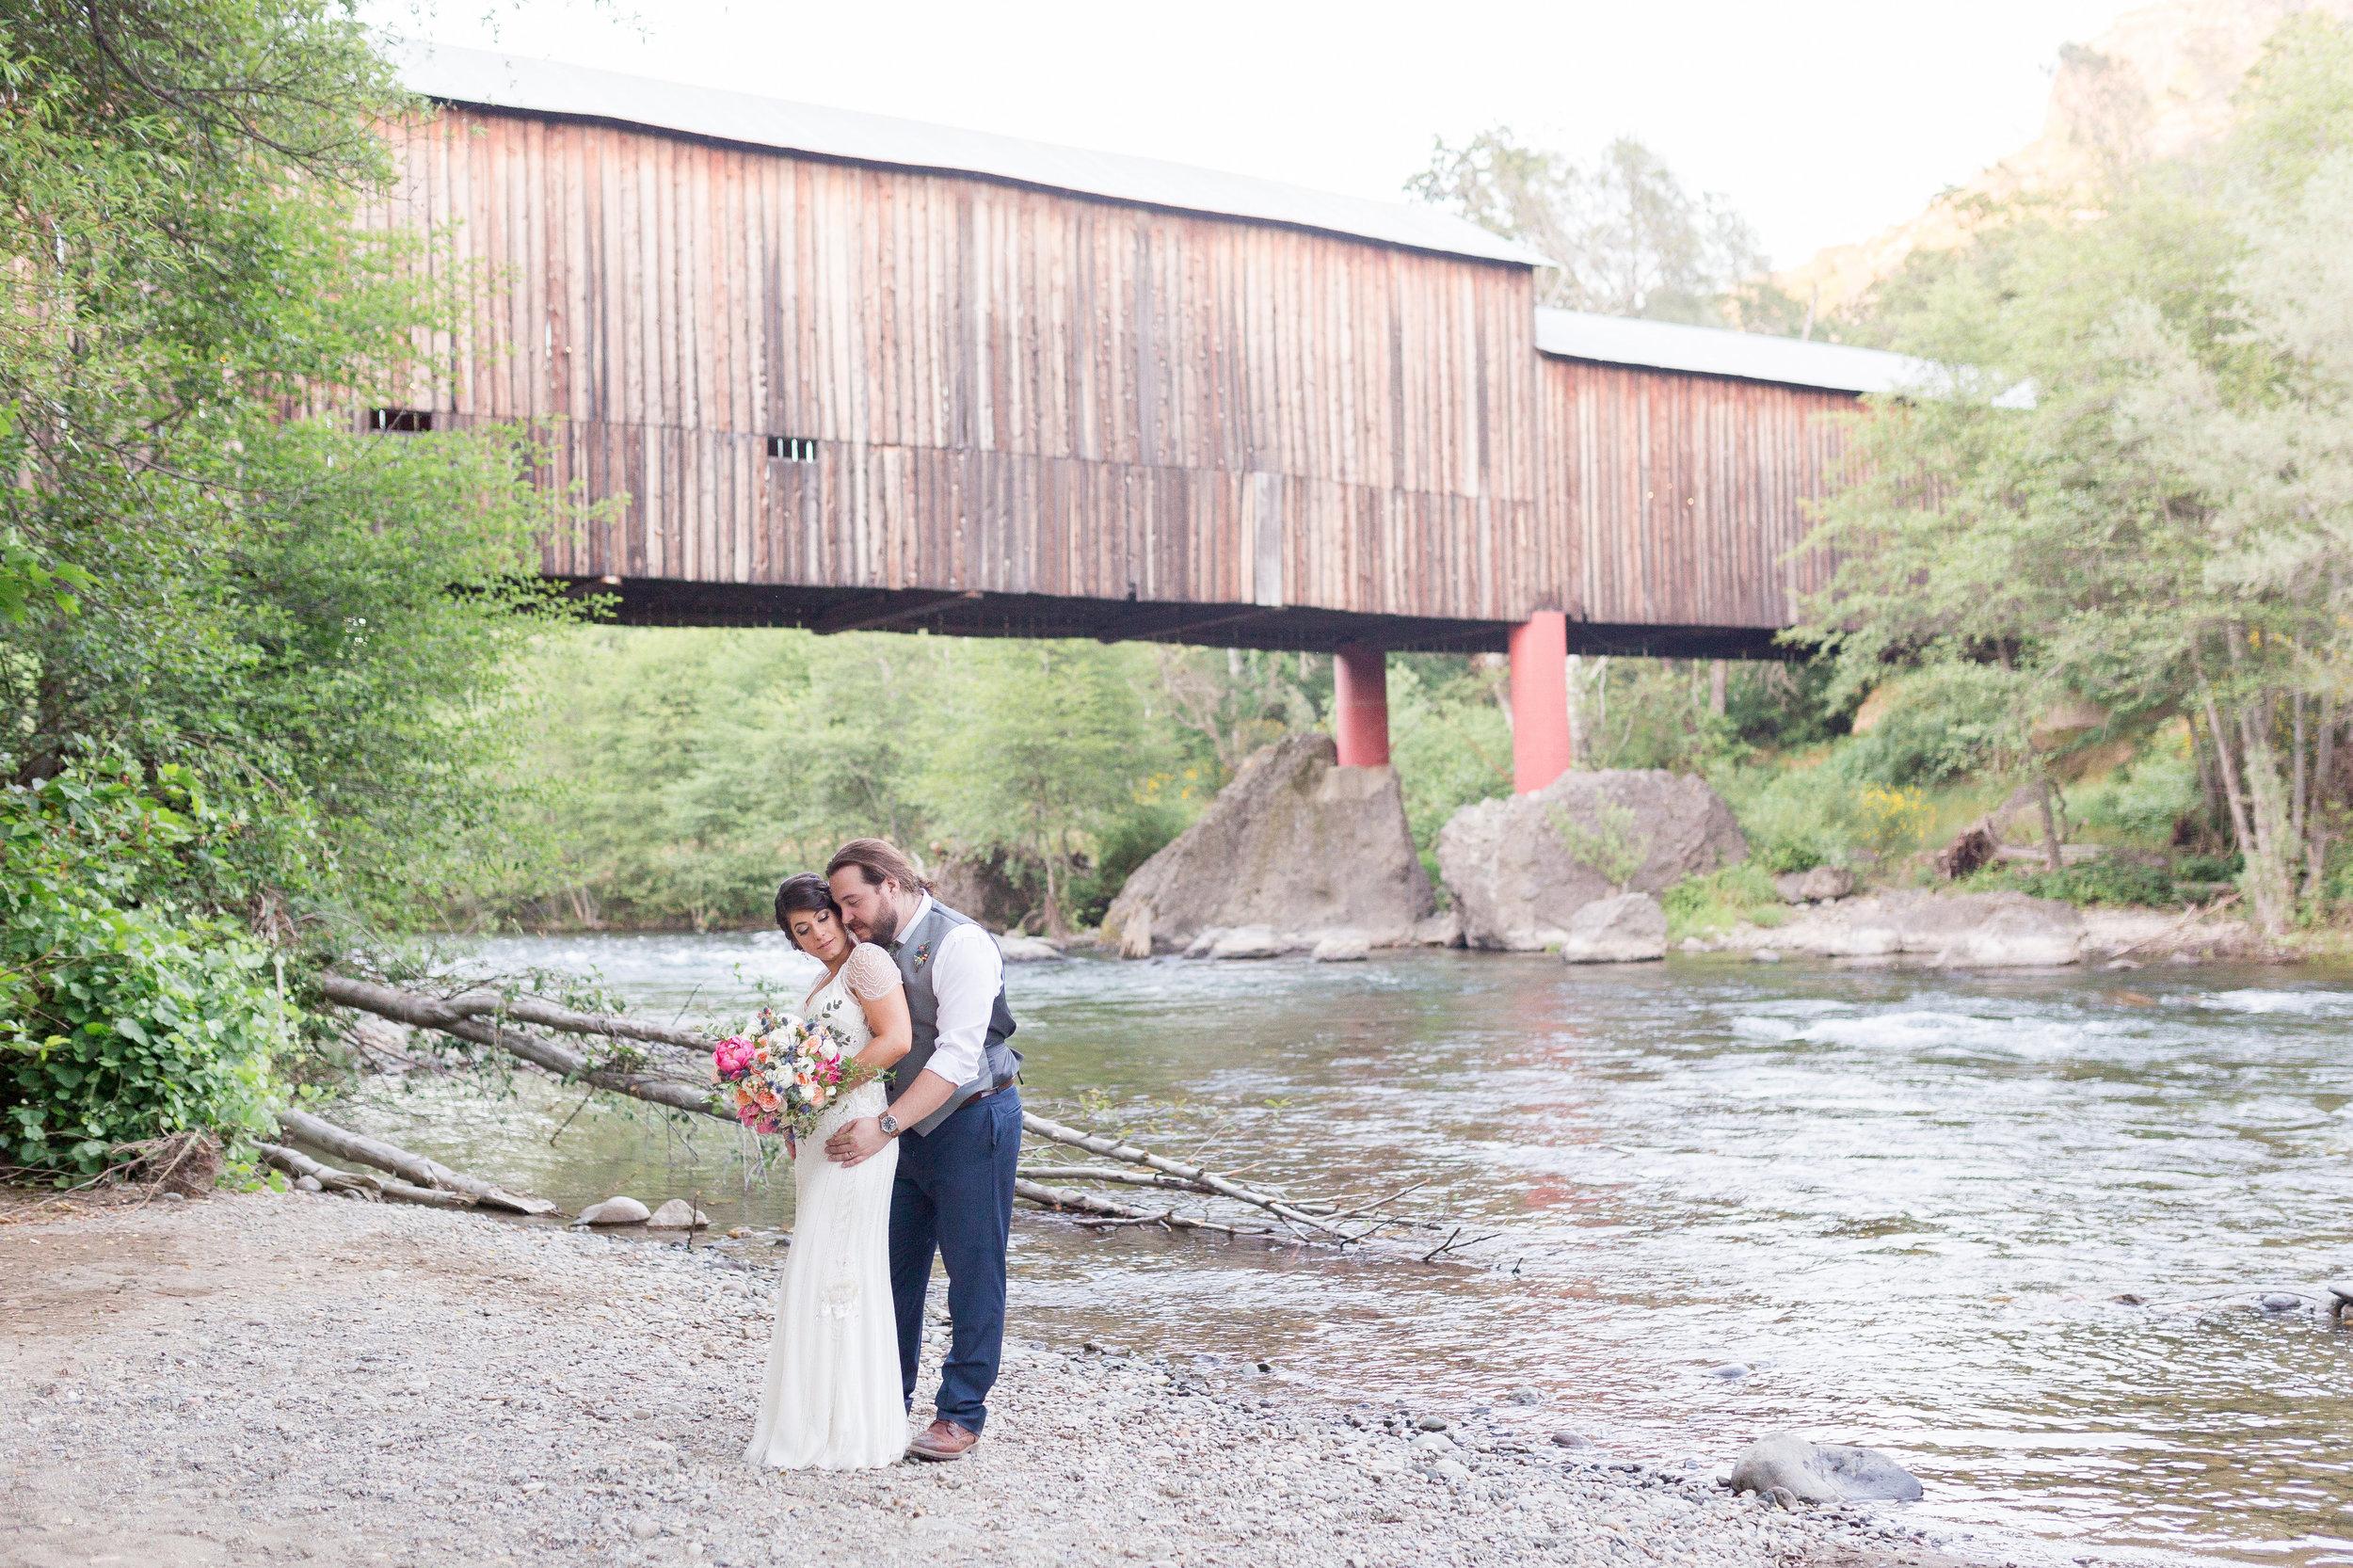 Chase Sabrina-TreCreative Wedding Favorites-0036.jpg